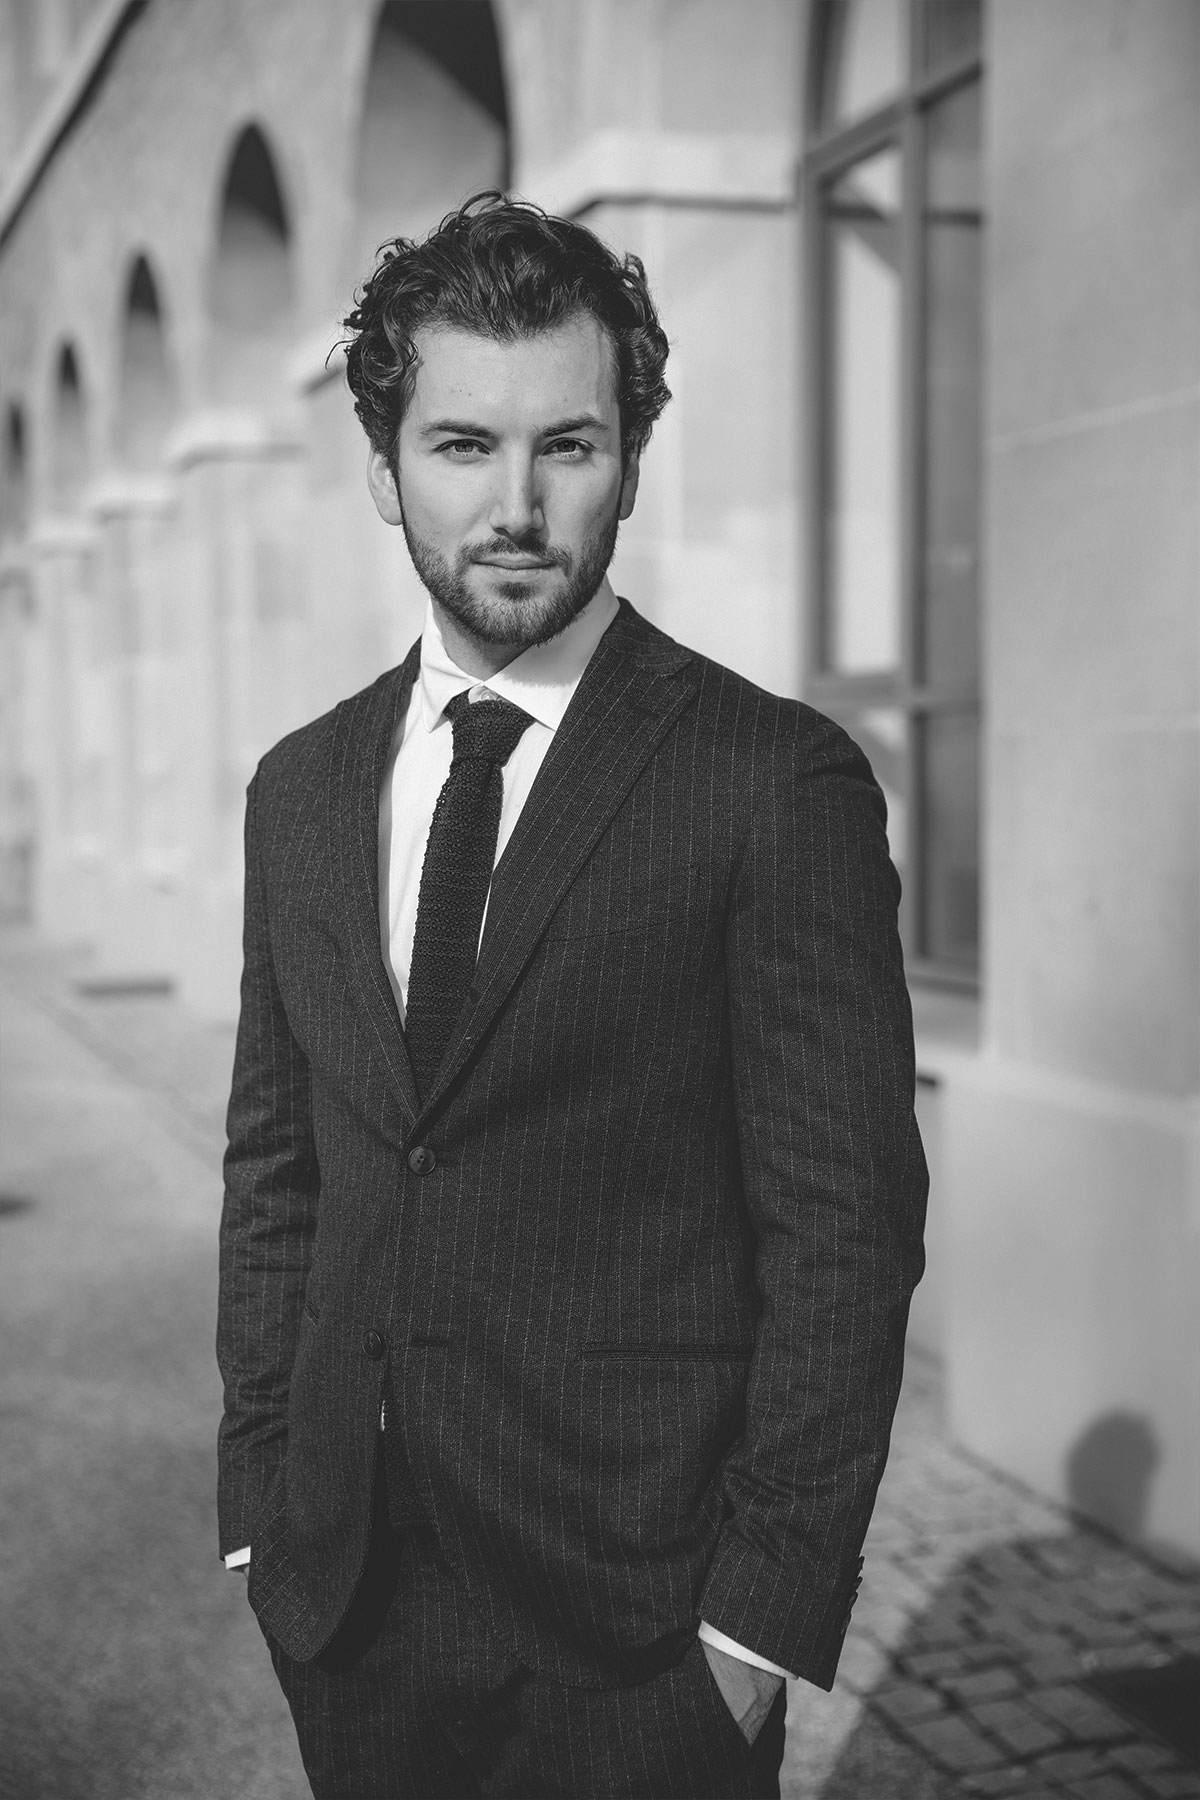 Anzug Mann Lifestyle Fotografie Portrait Business